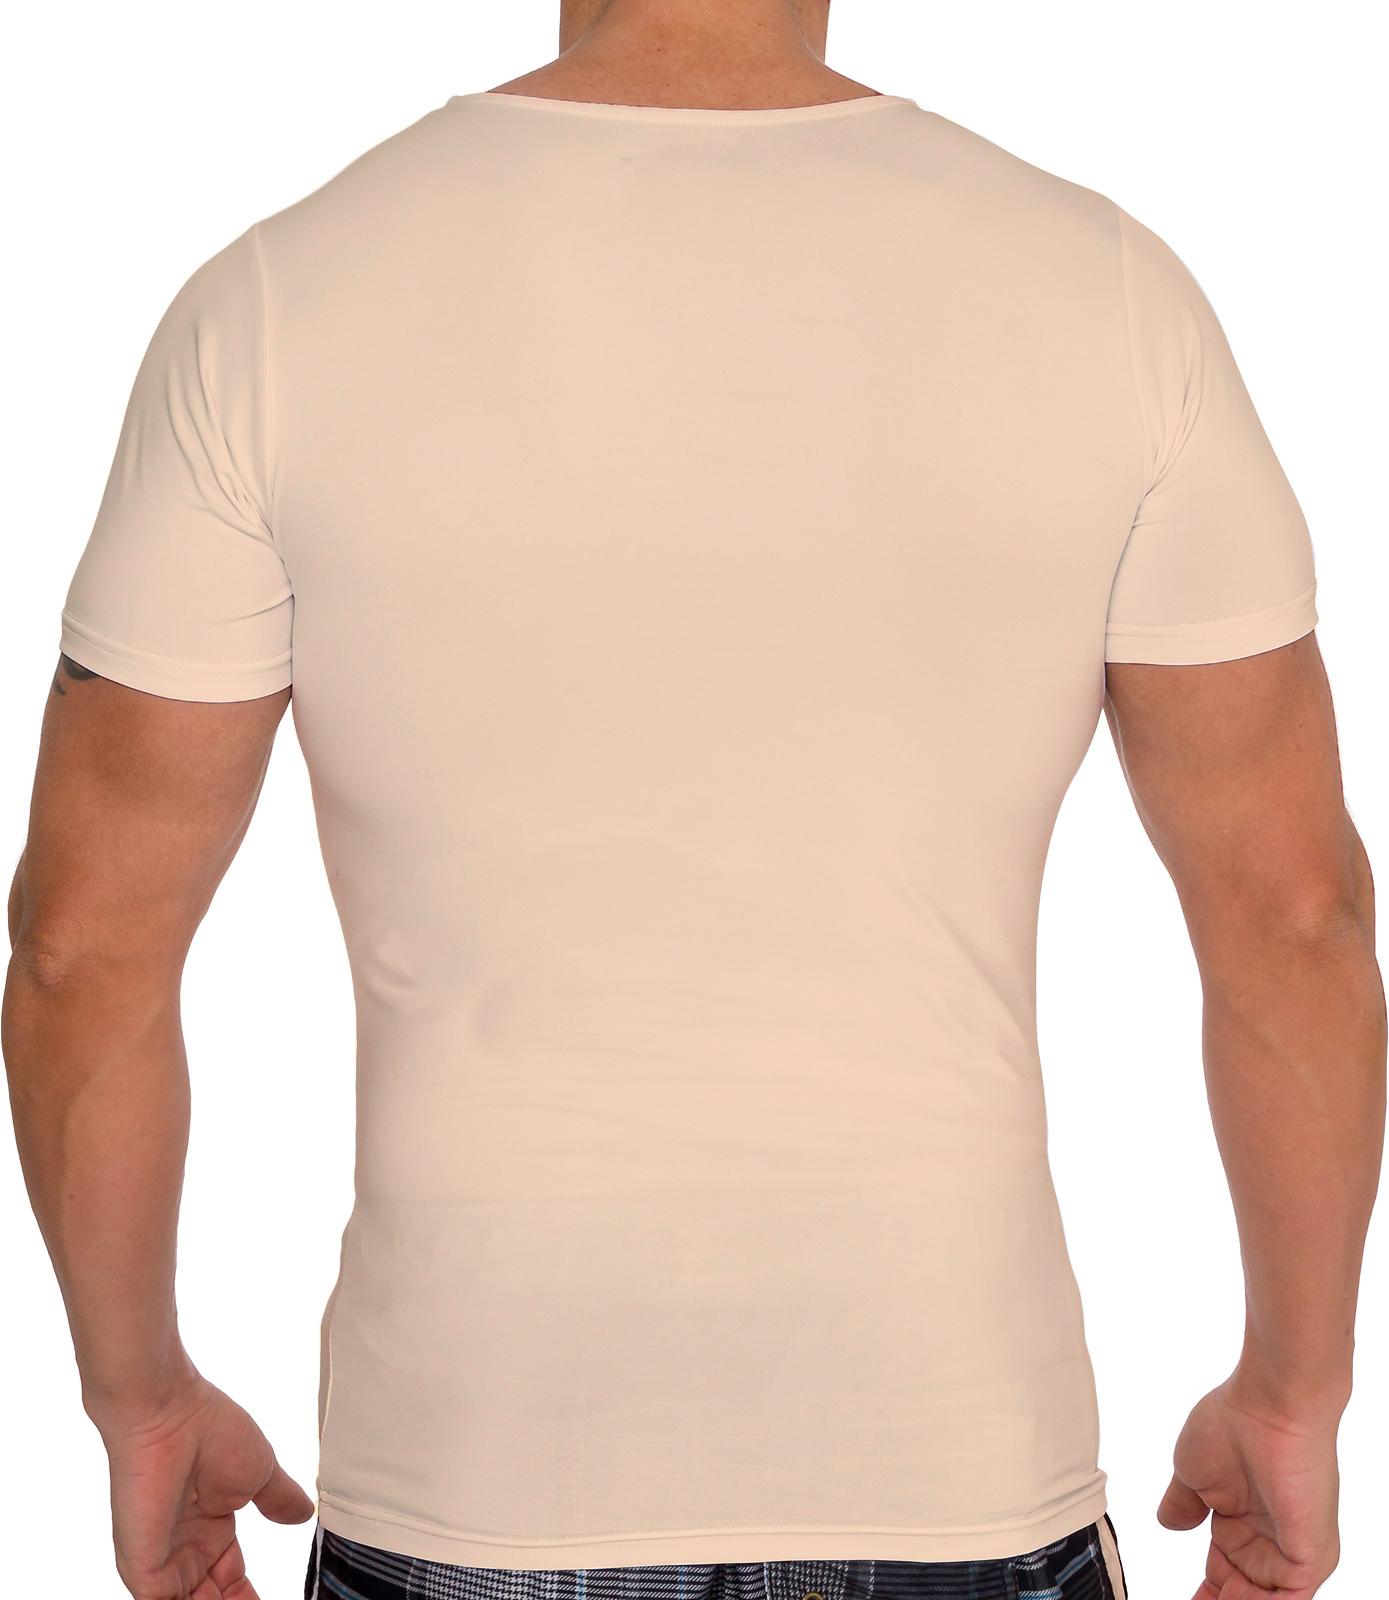 LISH-Men-039-s-Slimming-Compression-Body-Shaper-Gynecomastia-Undershirt thumbnail 17